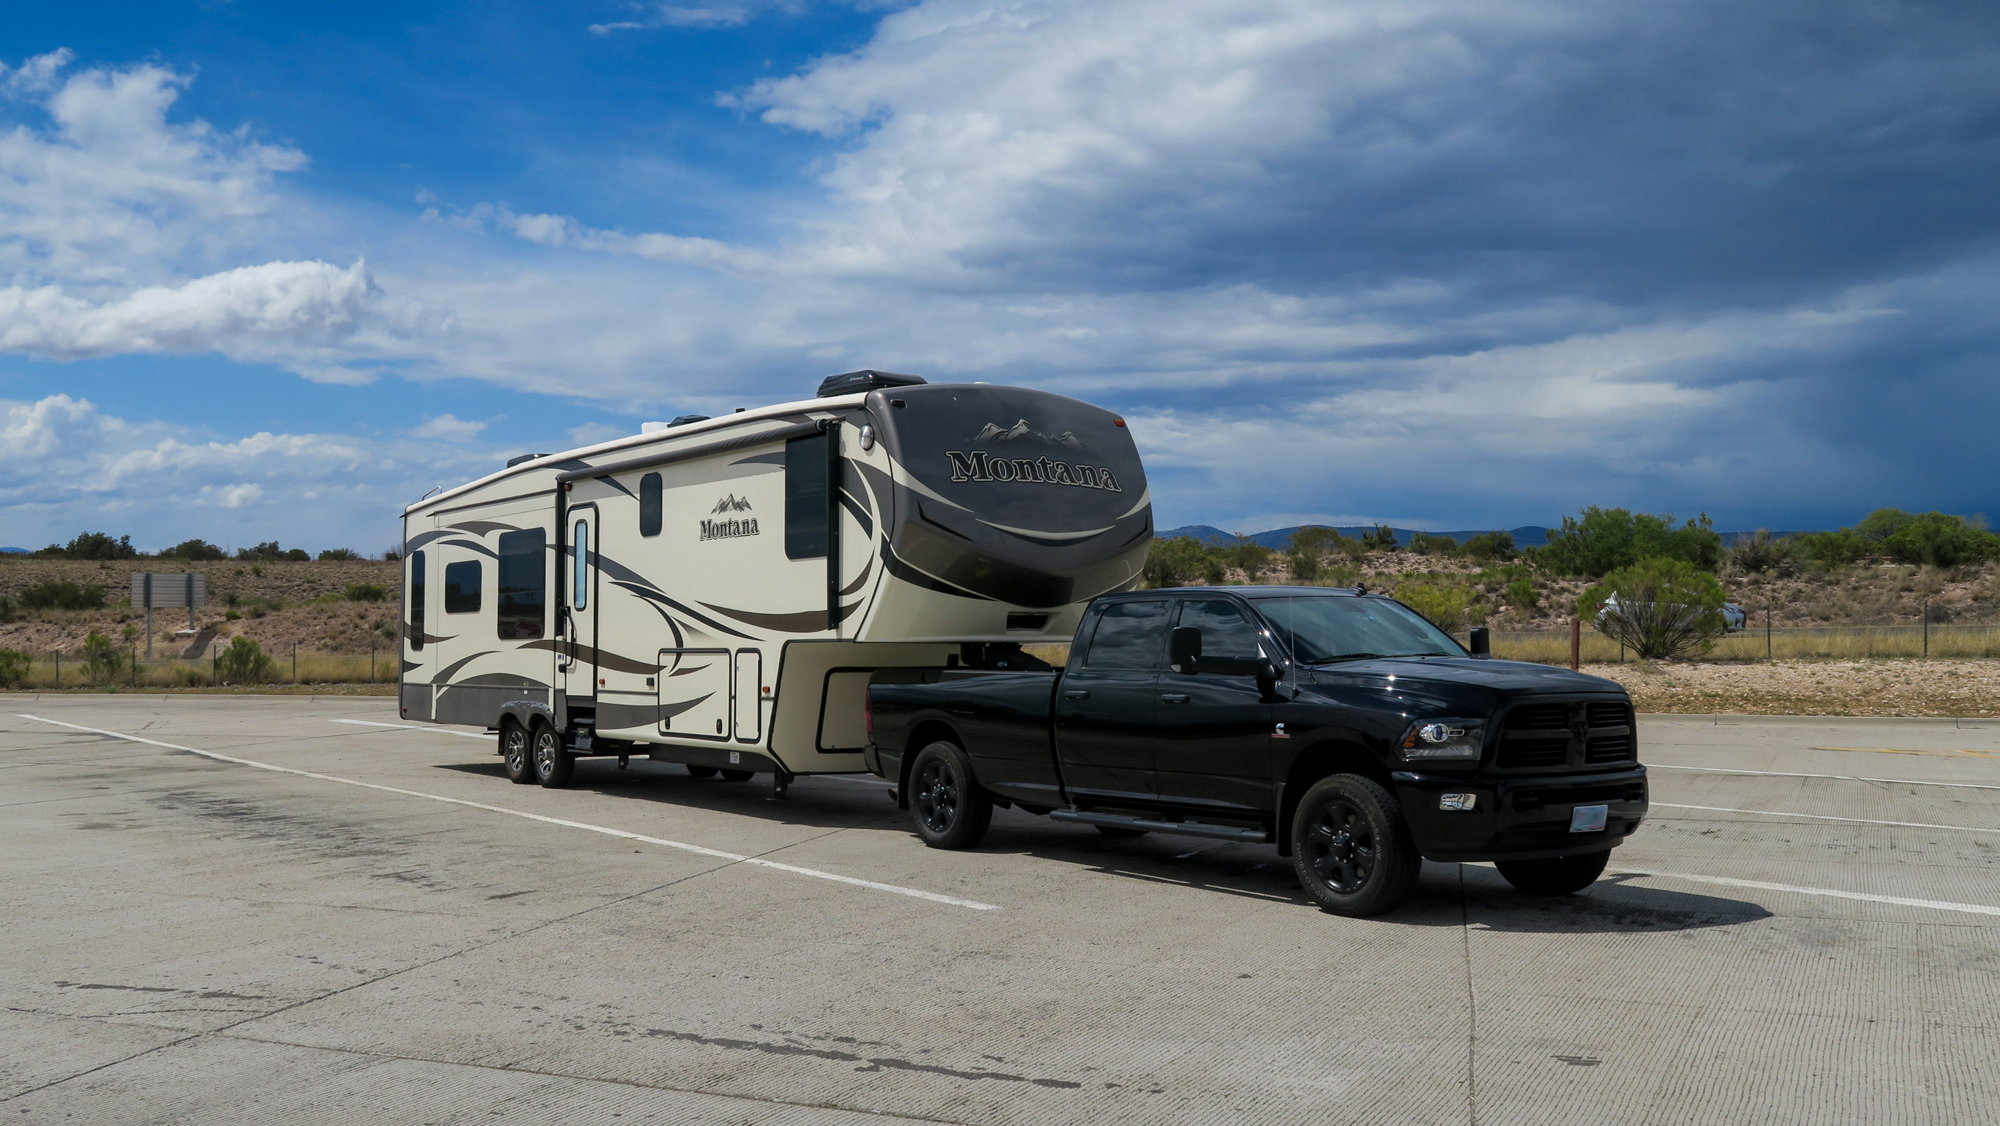 Phoenix to Flagstaff Arizona – Full Time RV